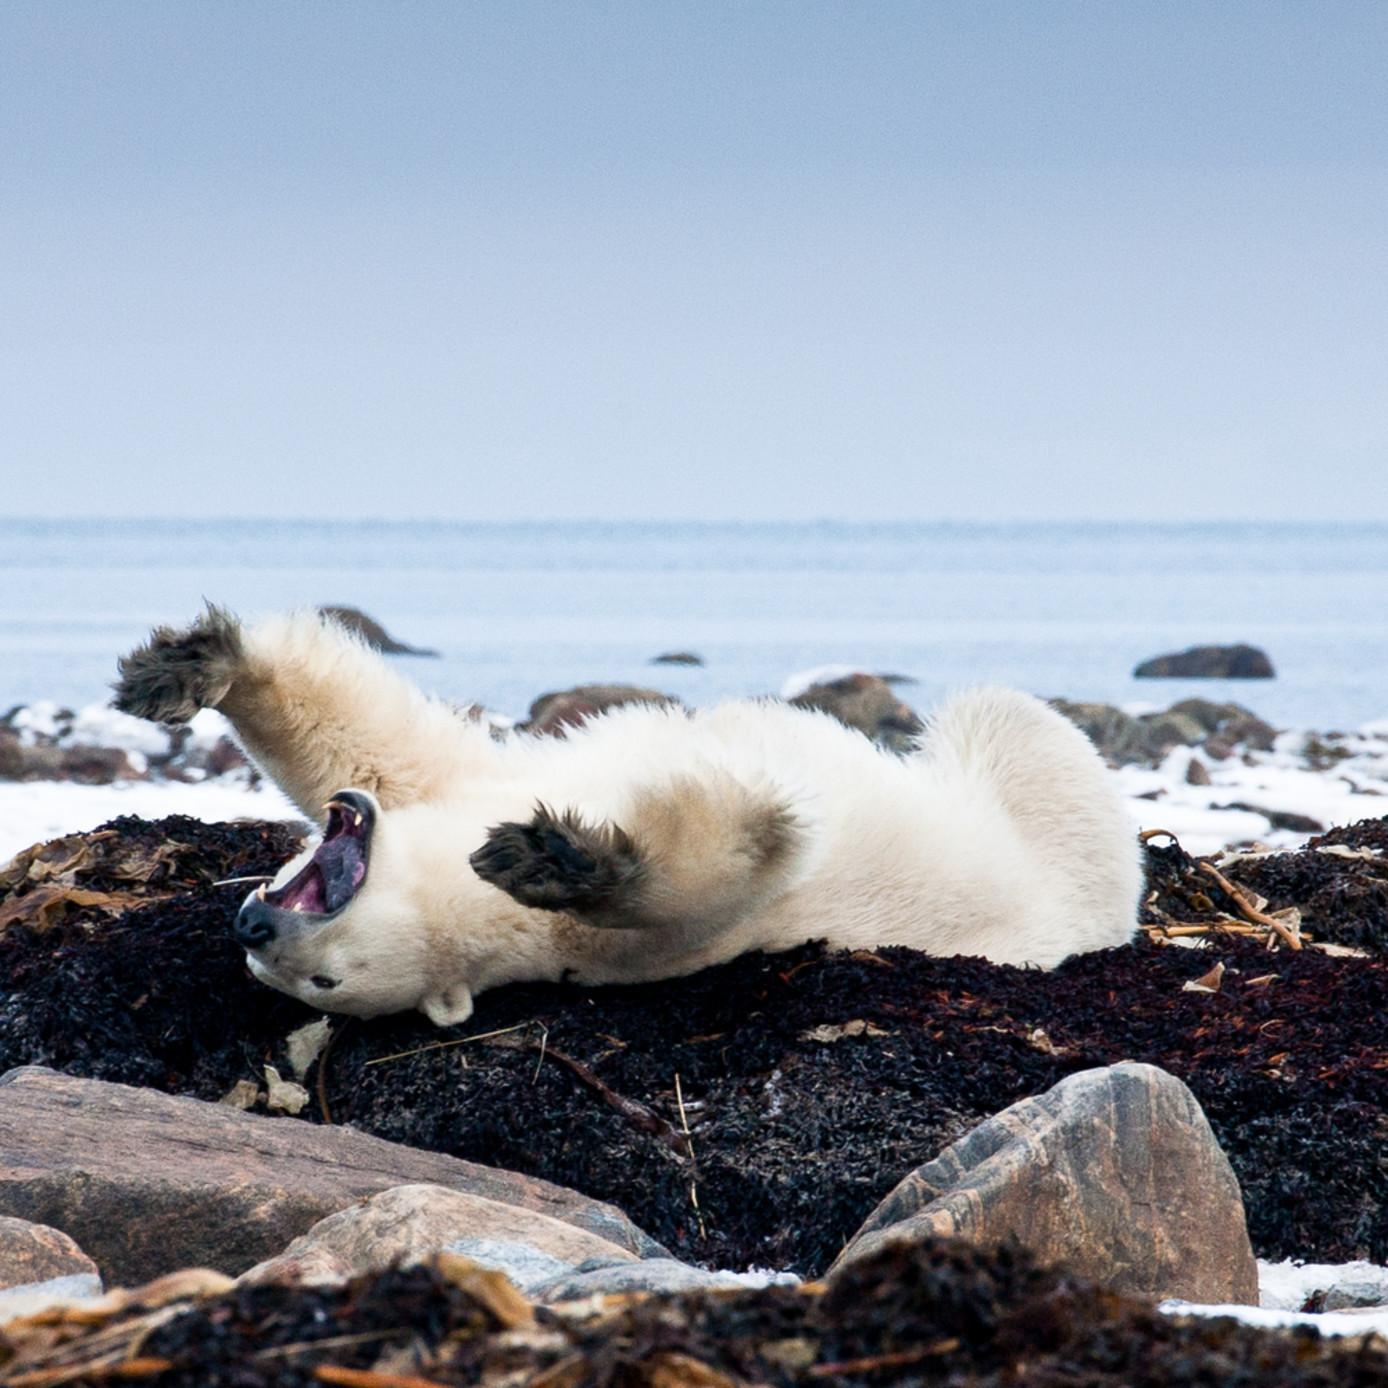 Polar bear f8ksec